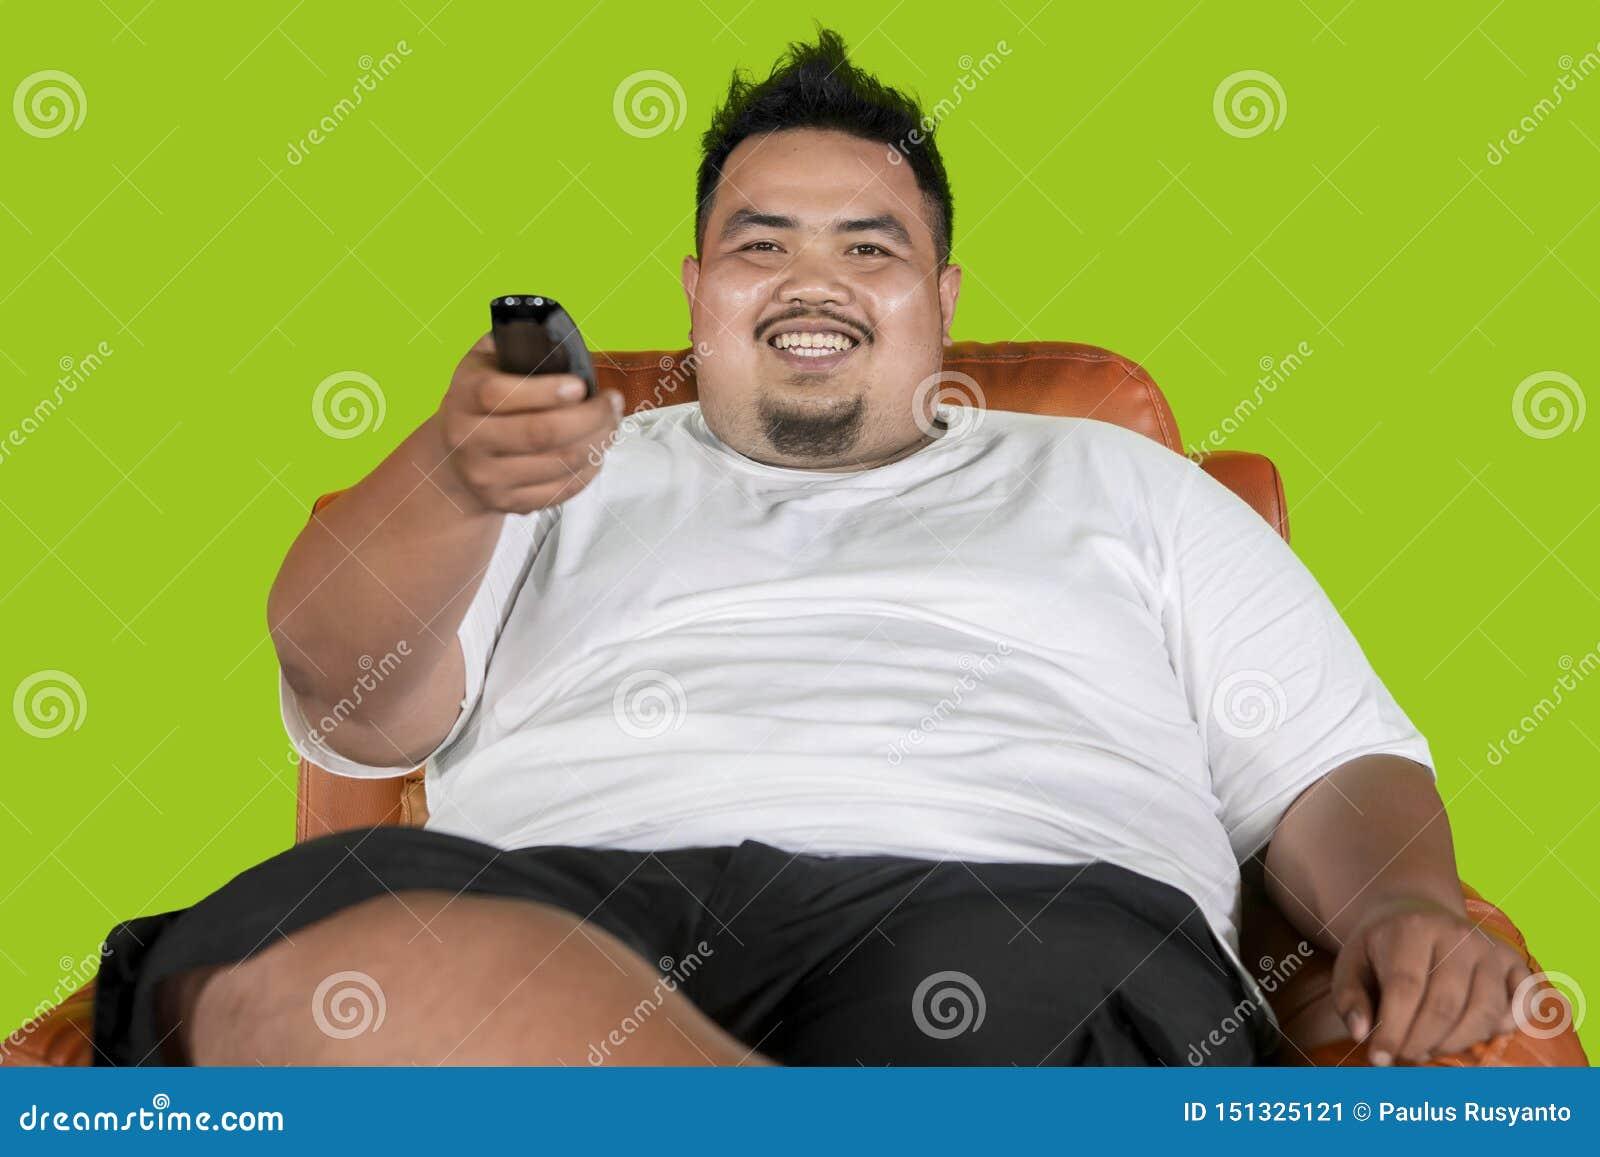 Japanese Fat Man